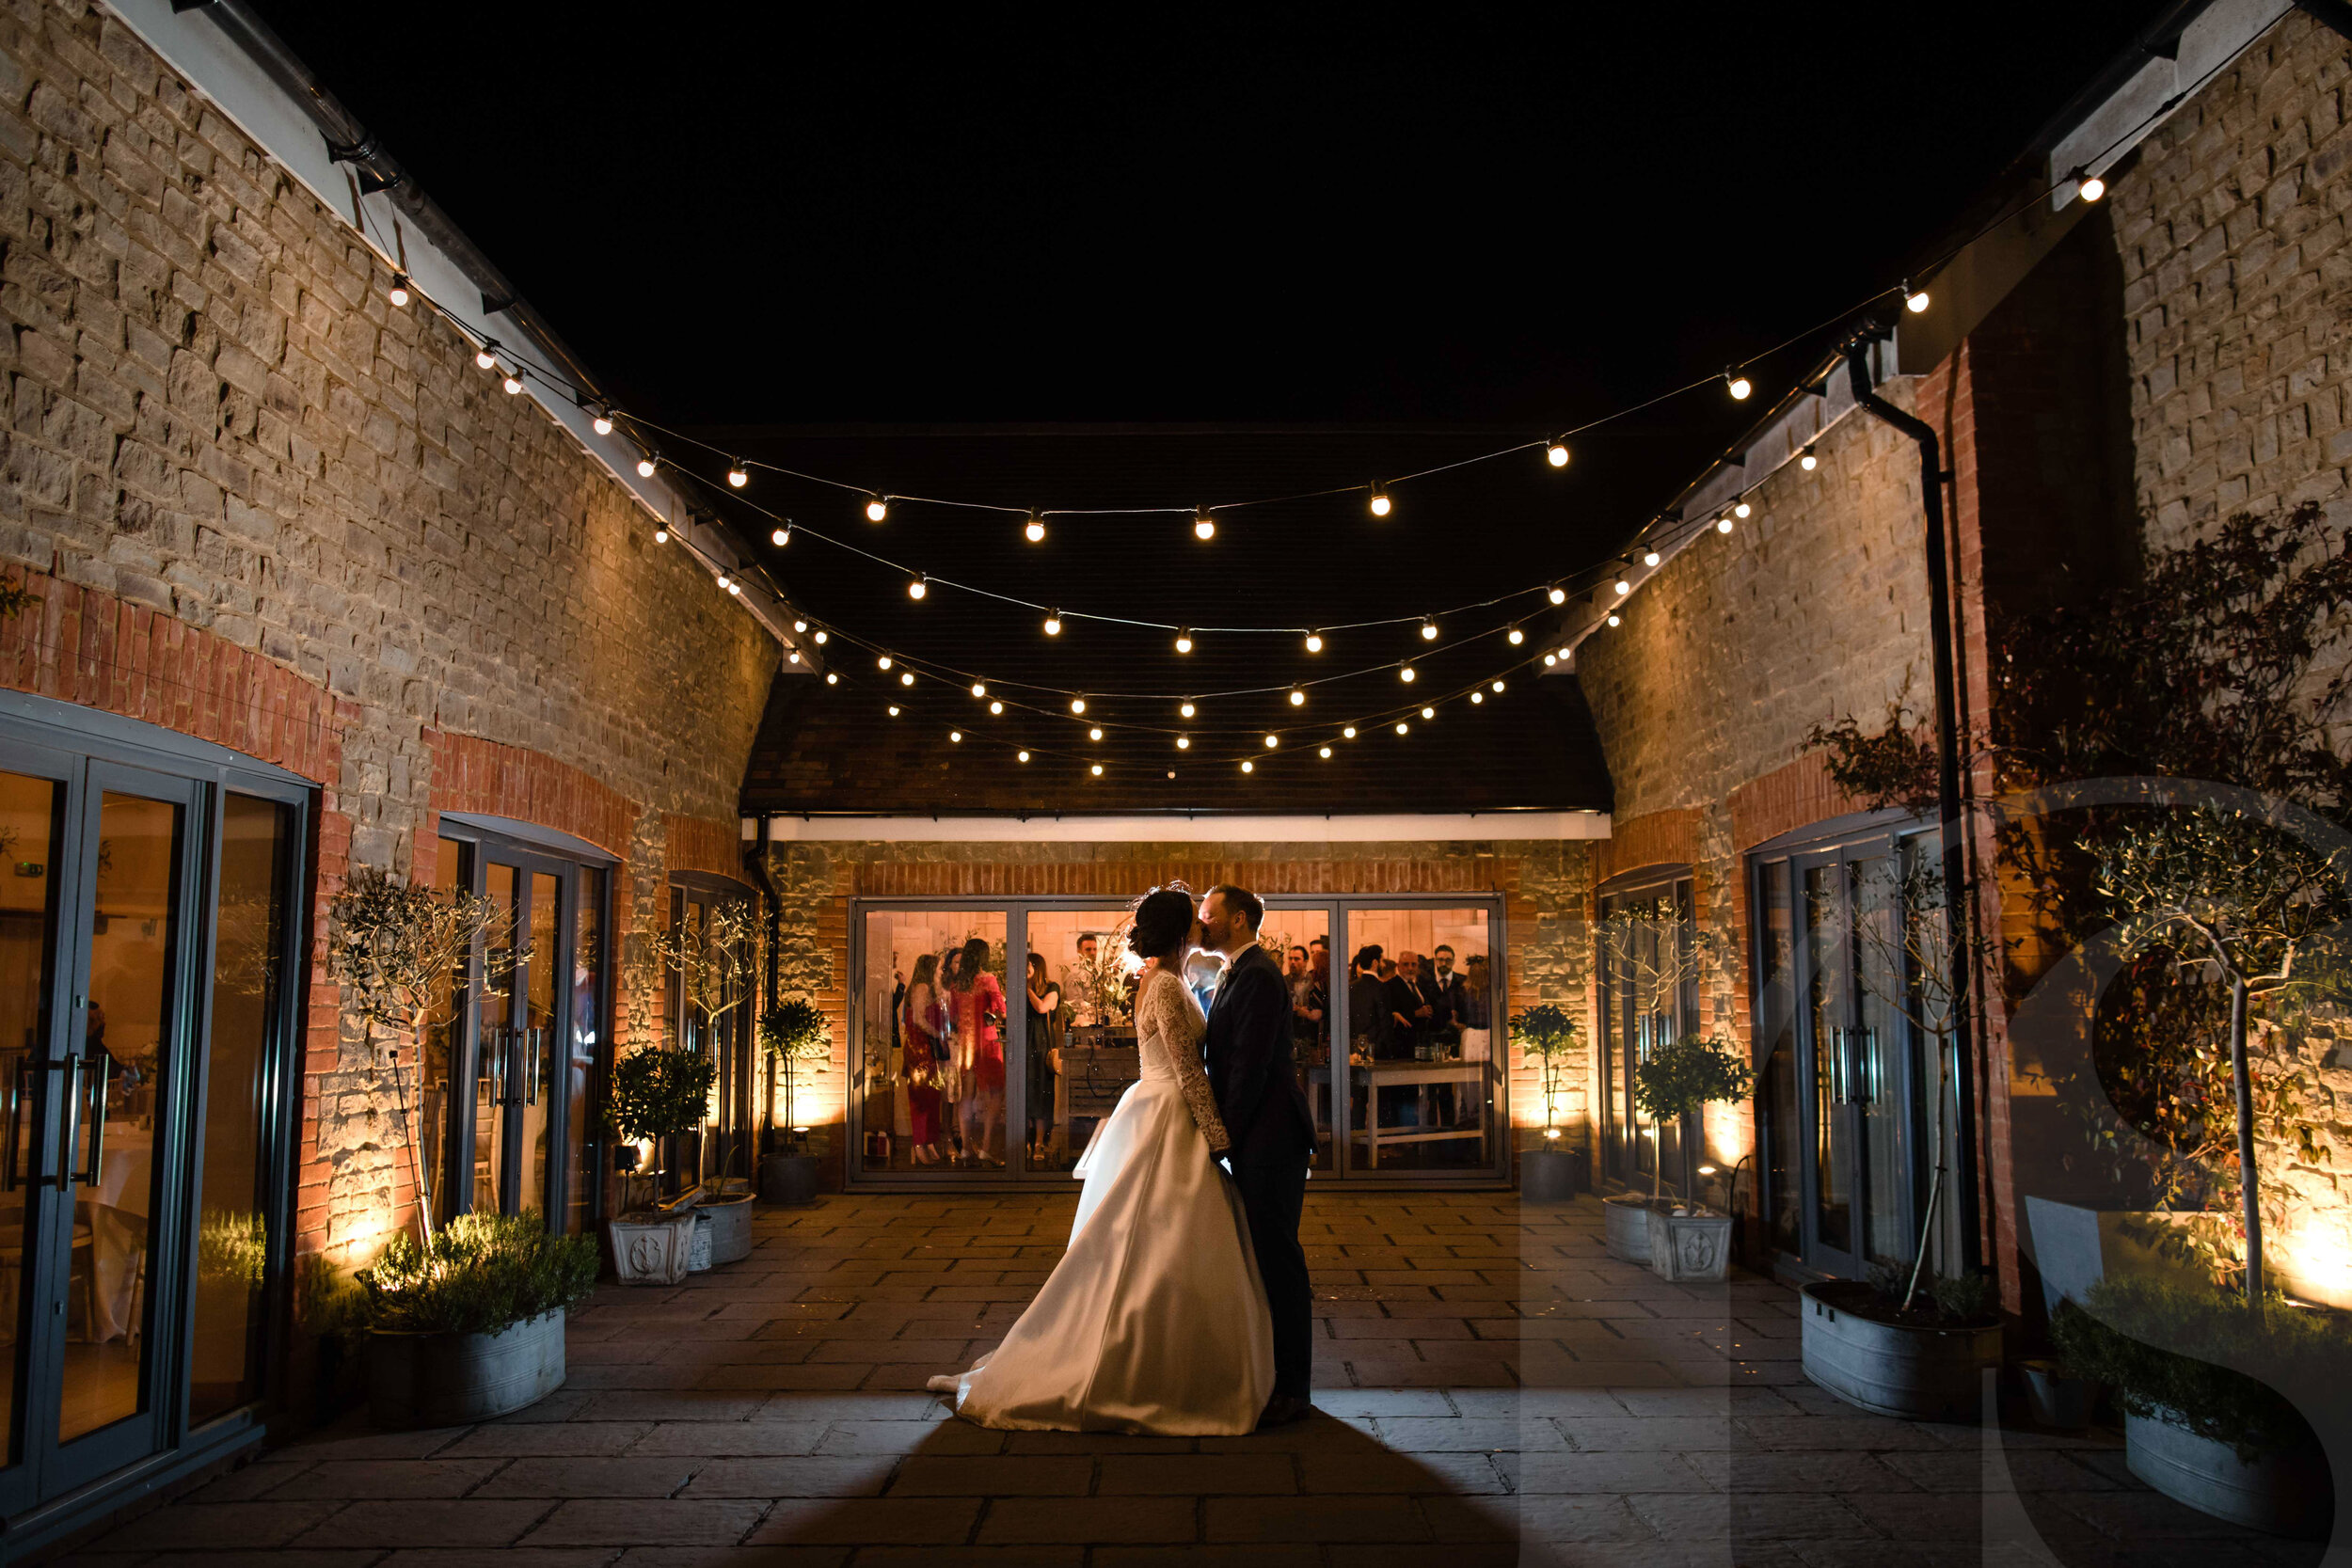 millbridge-court-wedding-photographer-2.jpg